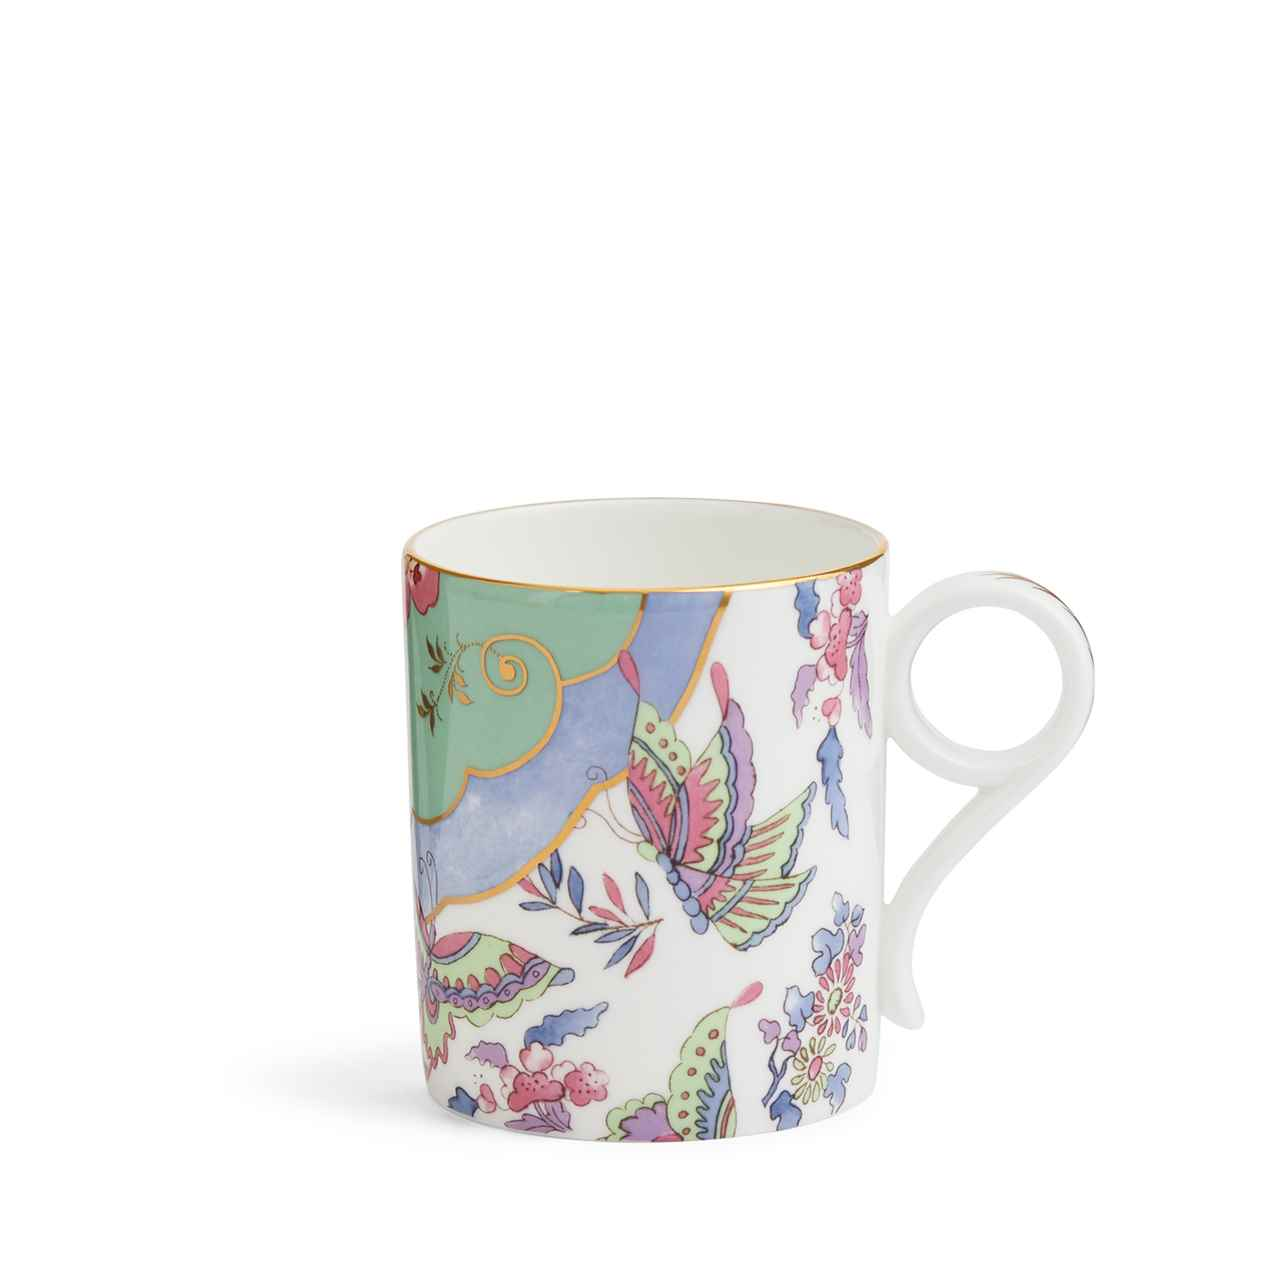 Wonderlust Butterfly Posy Mug